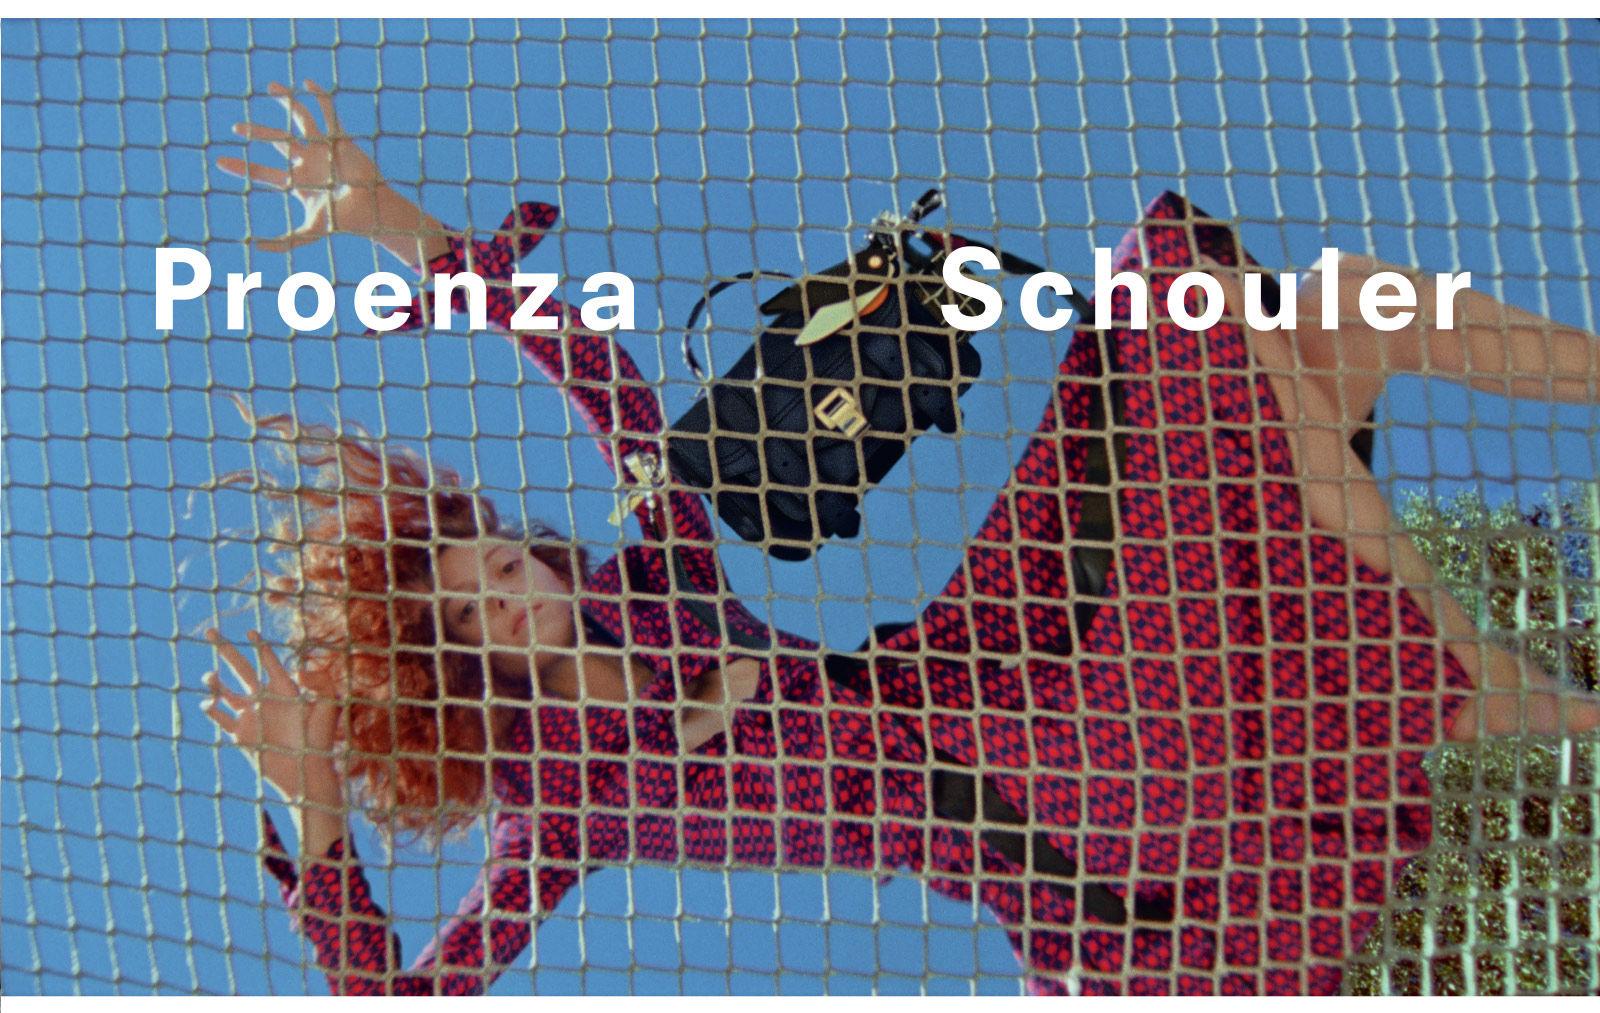 proenza schouler spring 2017 campaign